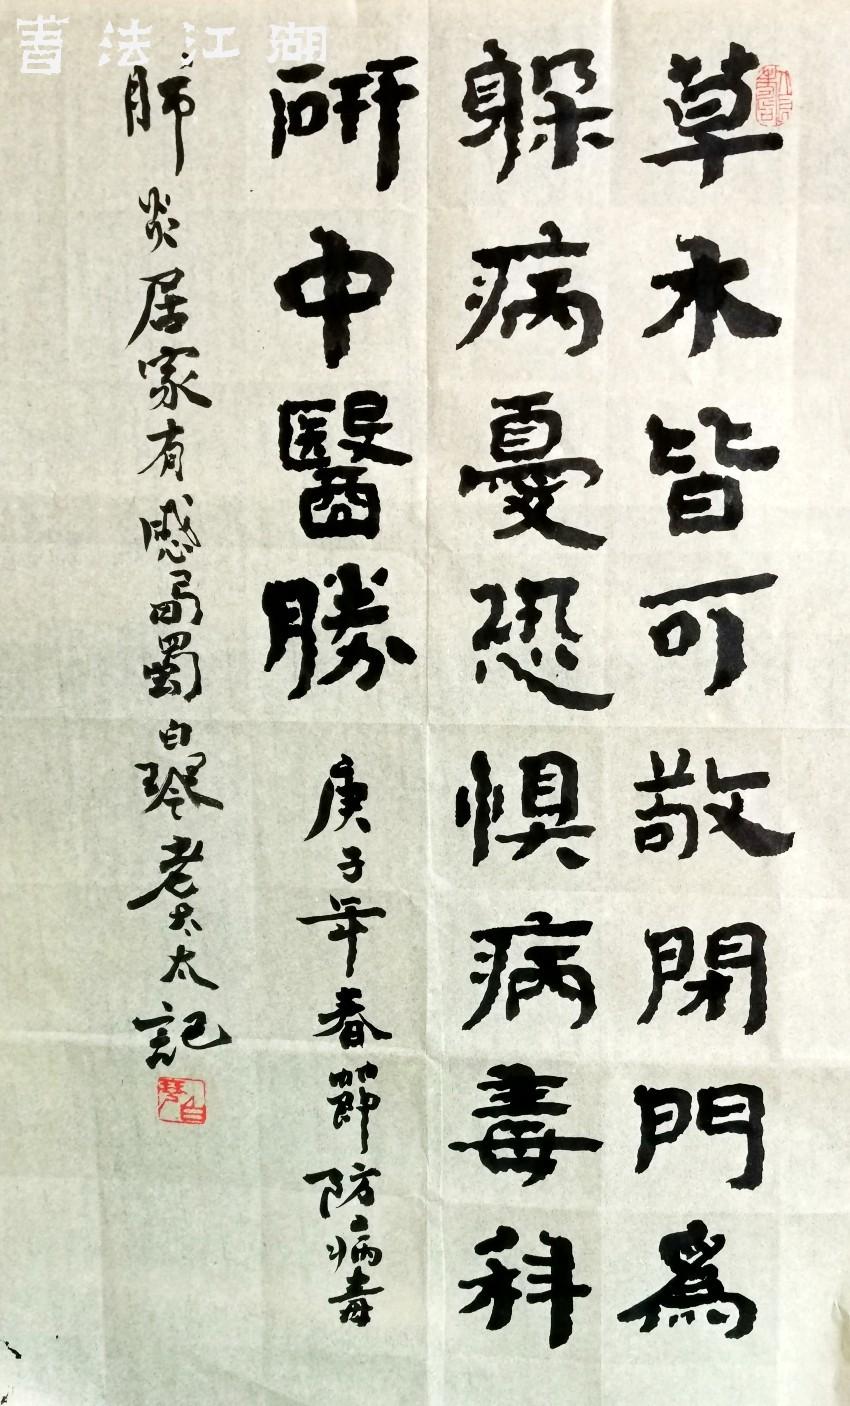 IMG_20200201_171918_conew1 2020春节有感.jpg1.jpg